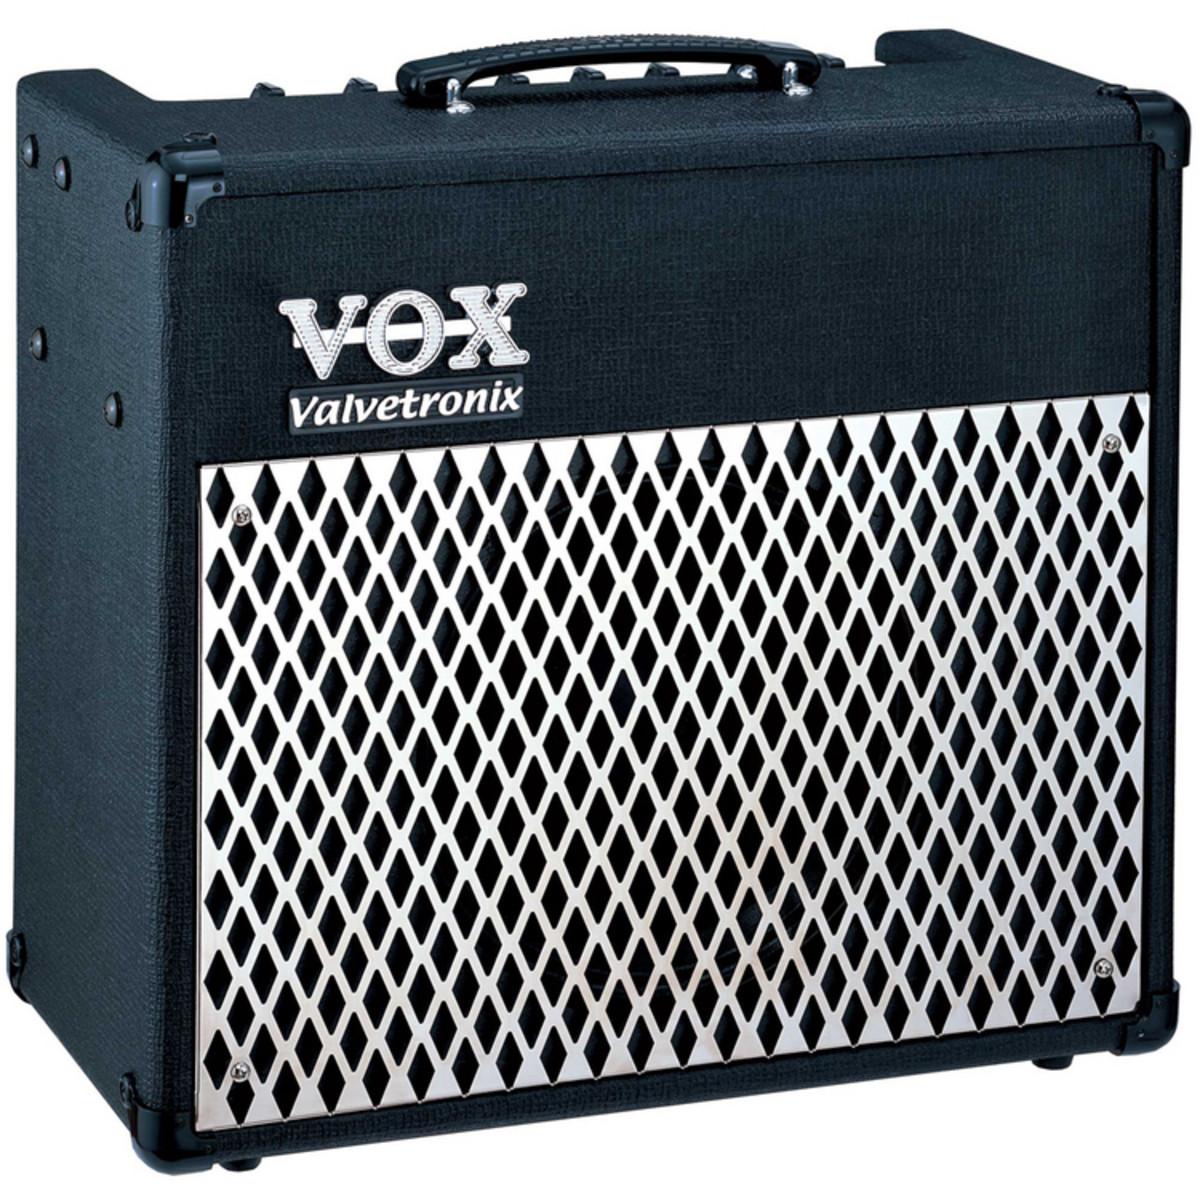 disc vox ad30vt valvetronix guitar amp at gear4music. Black Bedroom Furniture Sets. Home Design Ideas